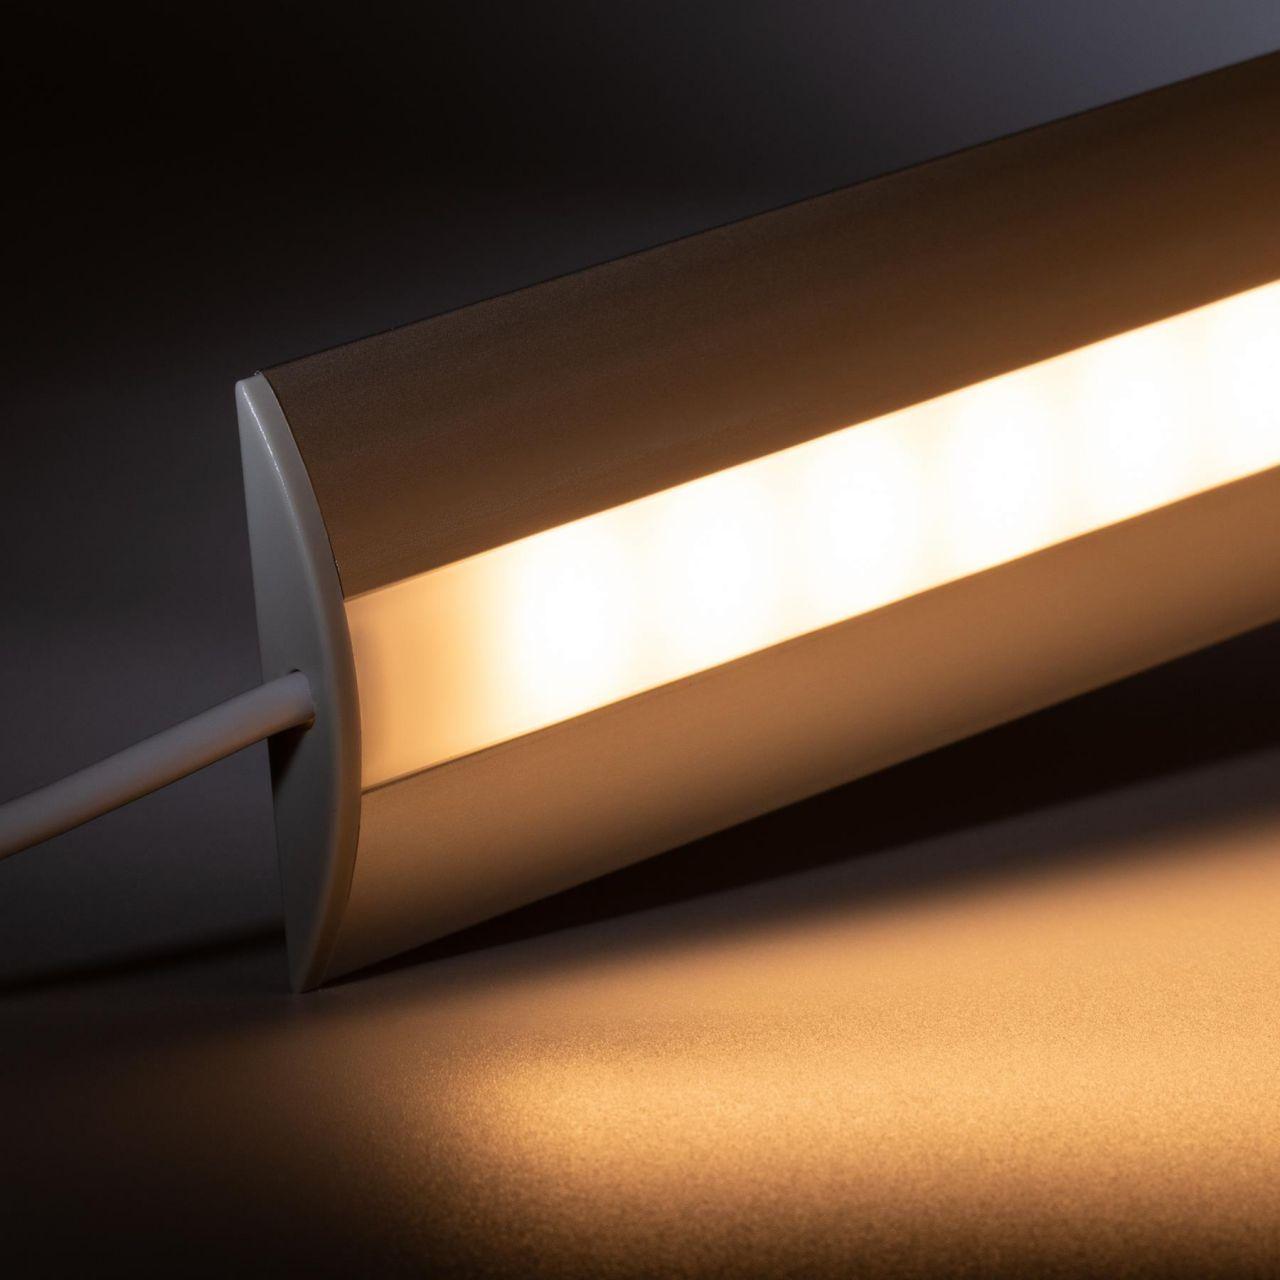 12V Aluminium Türschwellen LED Leiste - warmweiß - diffuse Abdeckung